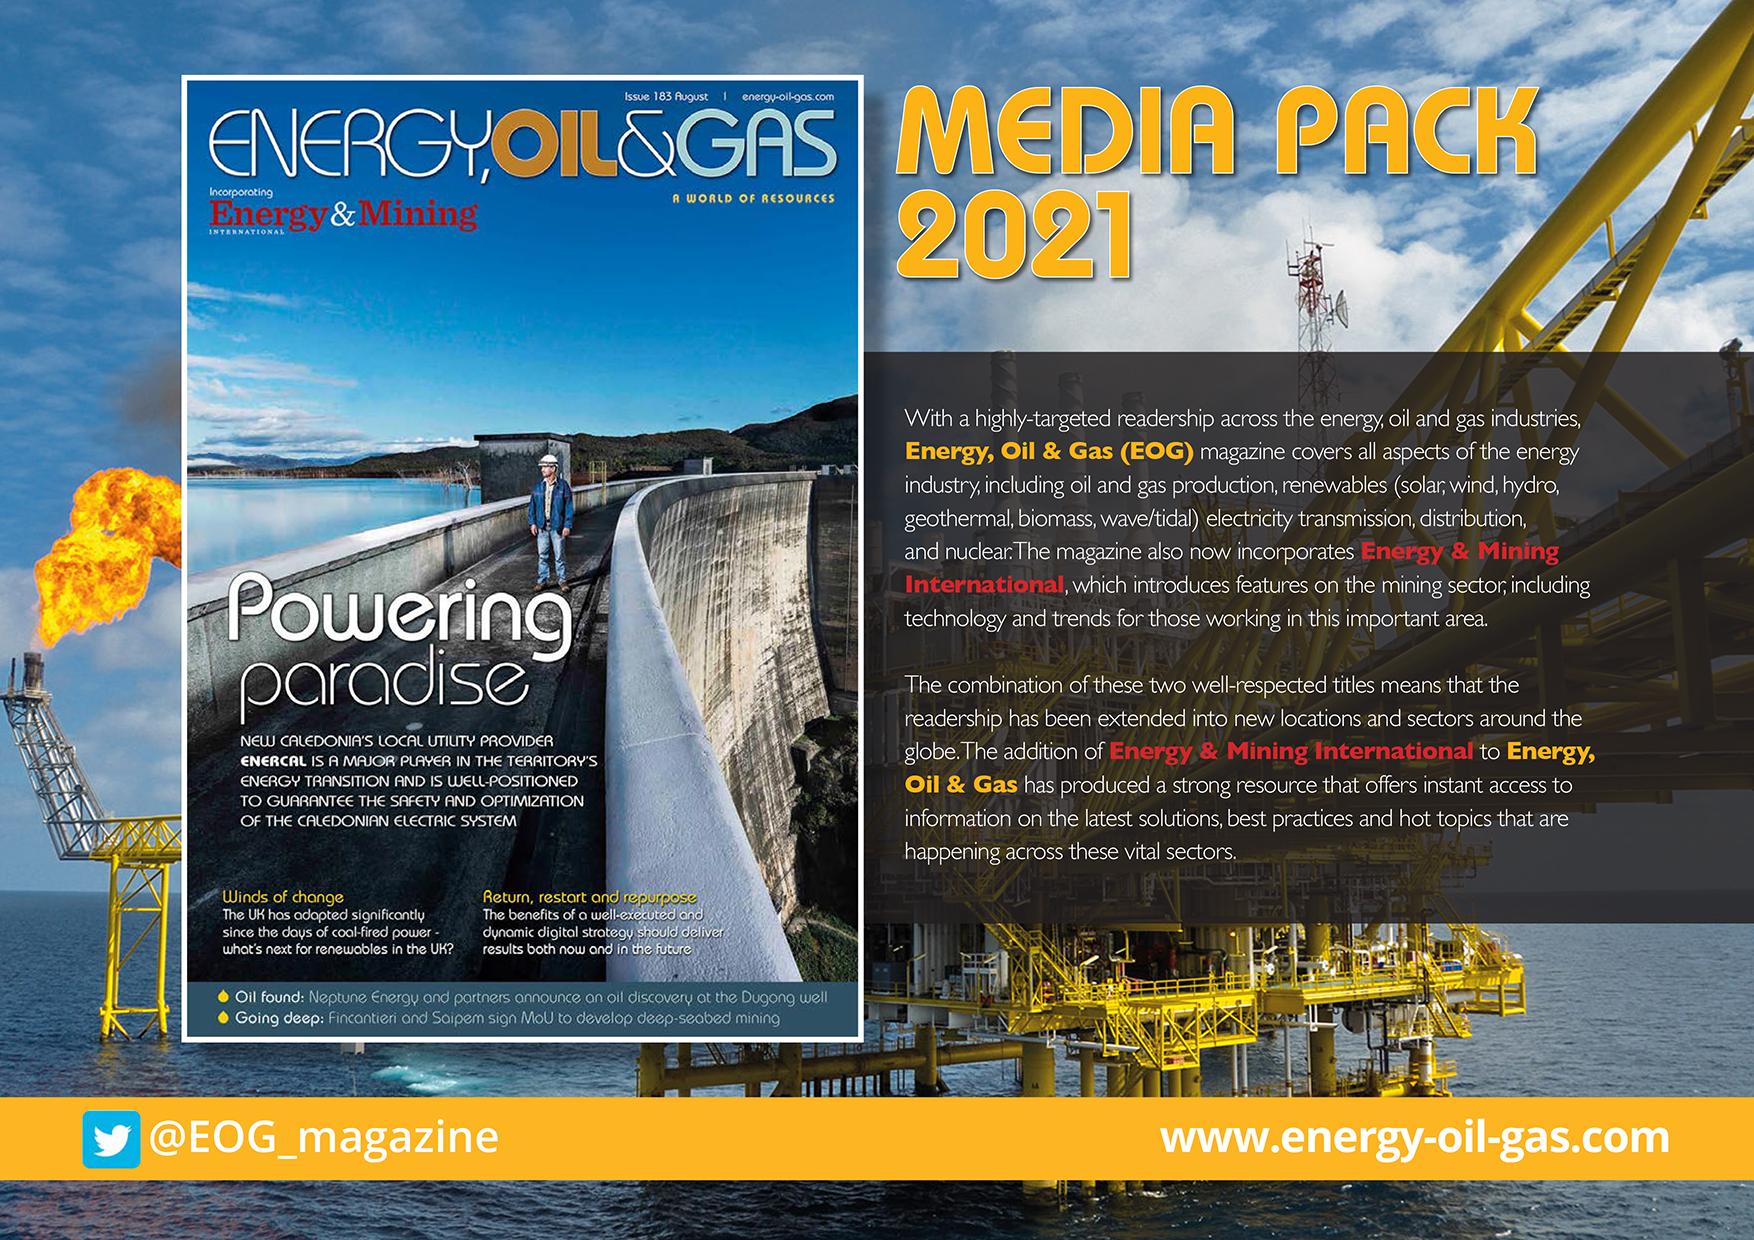 EOG Media pack 2021 - Front cover